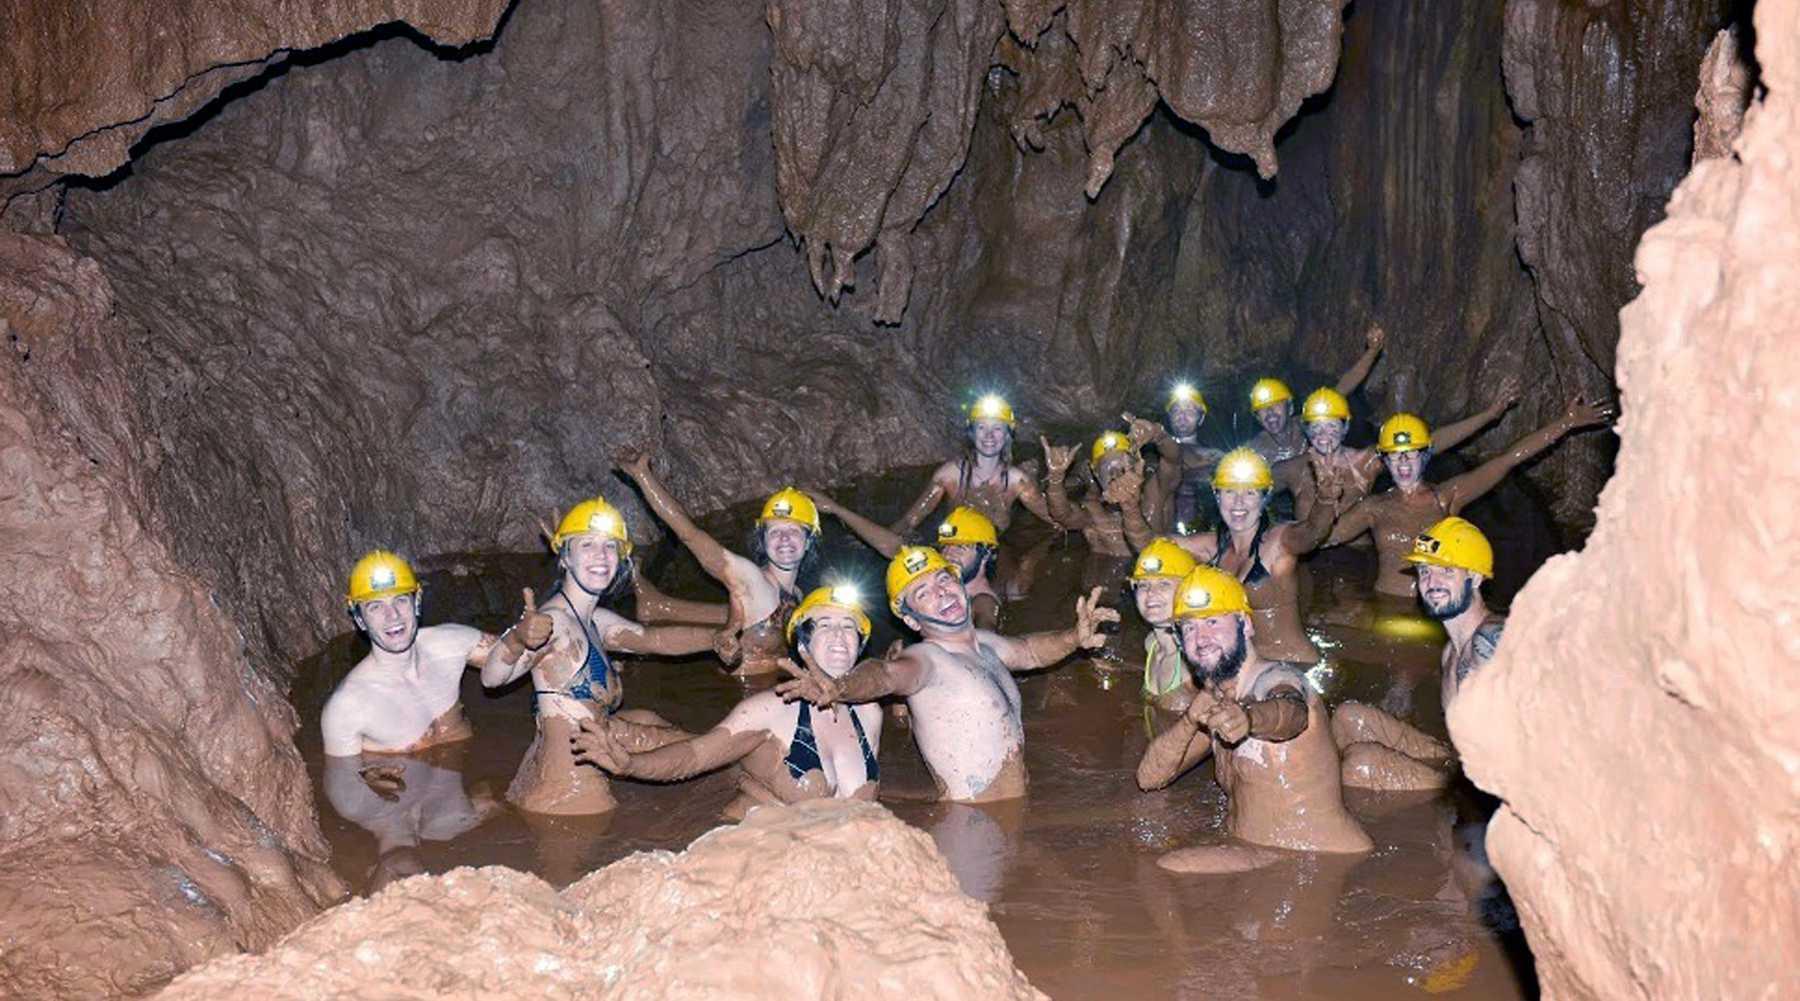 Dark Cave in Phong Nha – Modder kruipen, tokkelen en kajakken